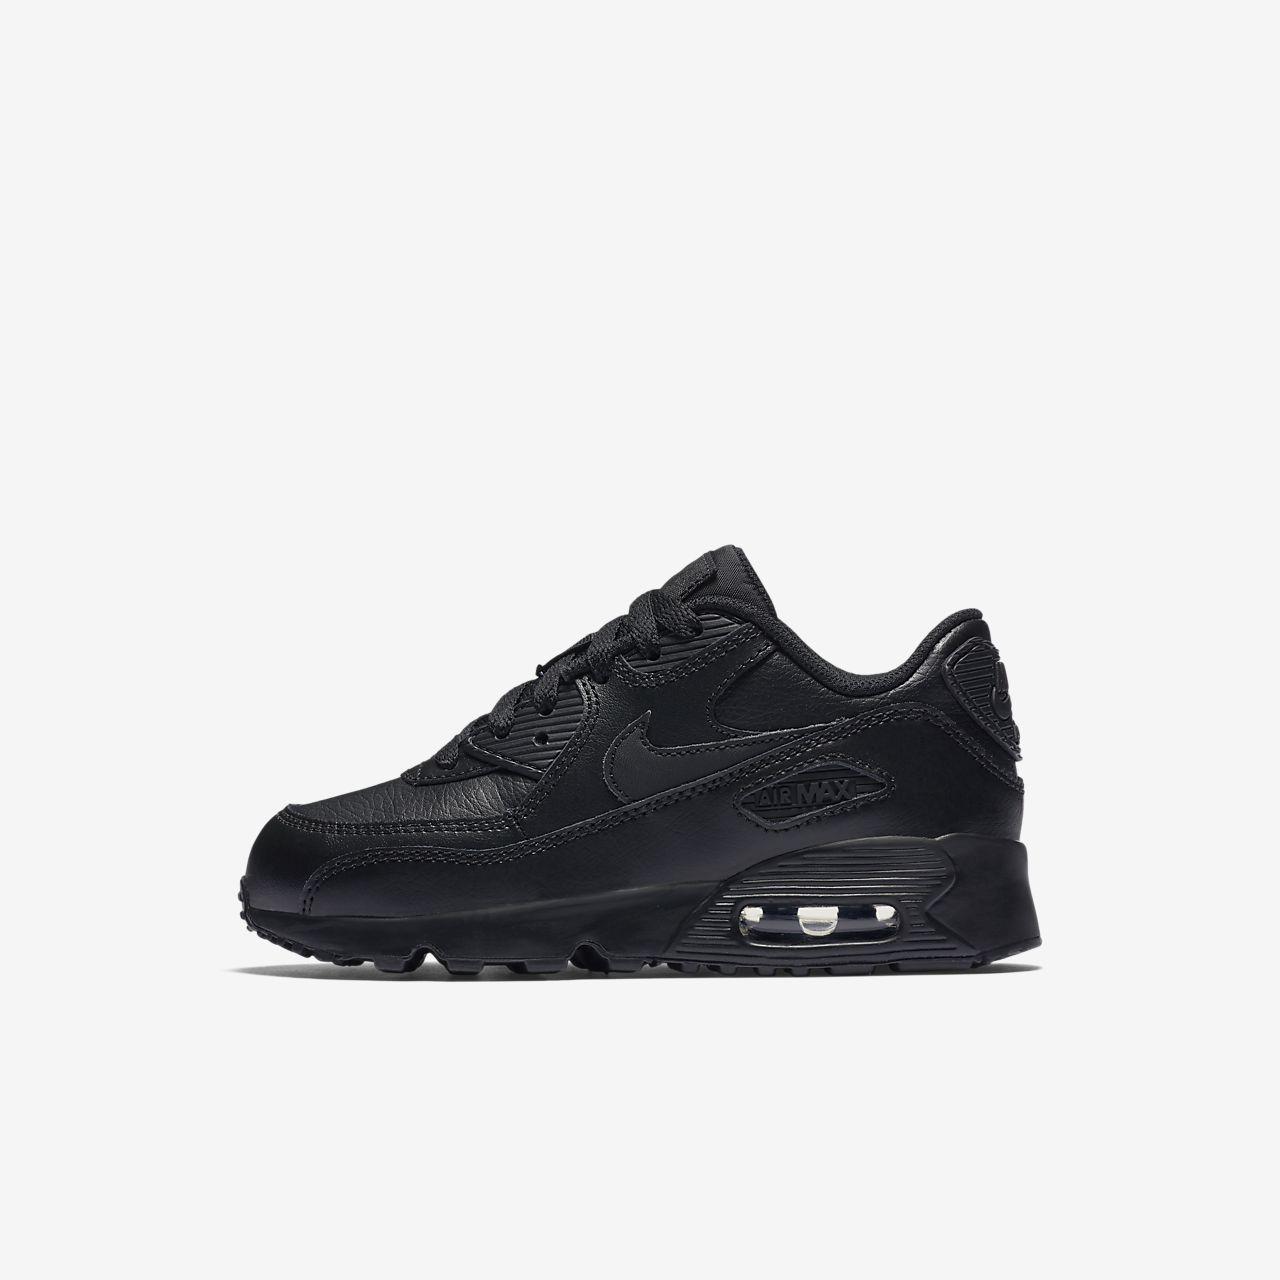 Nike Air Max 90 Leather cipő gyerekeknek